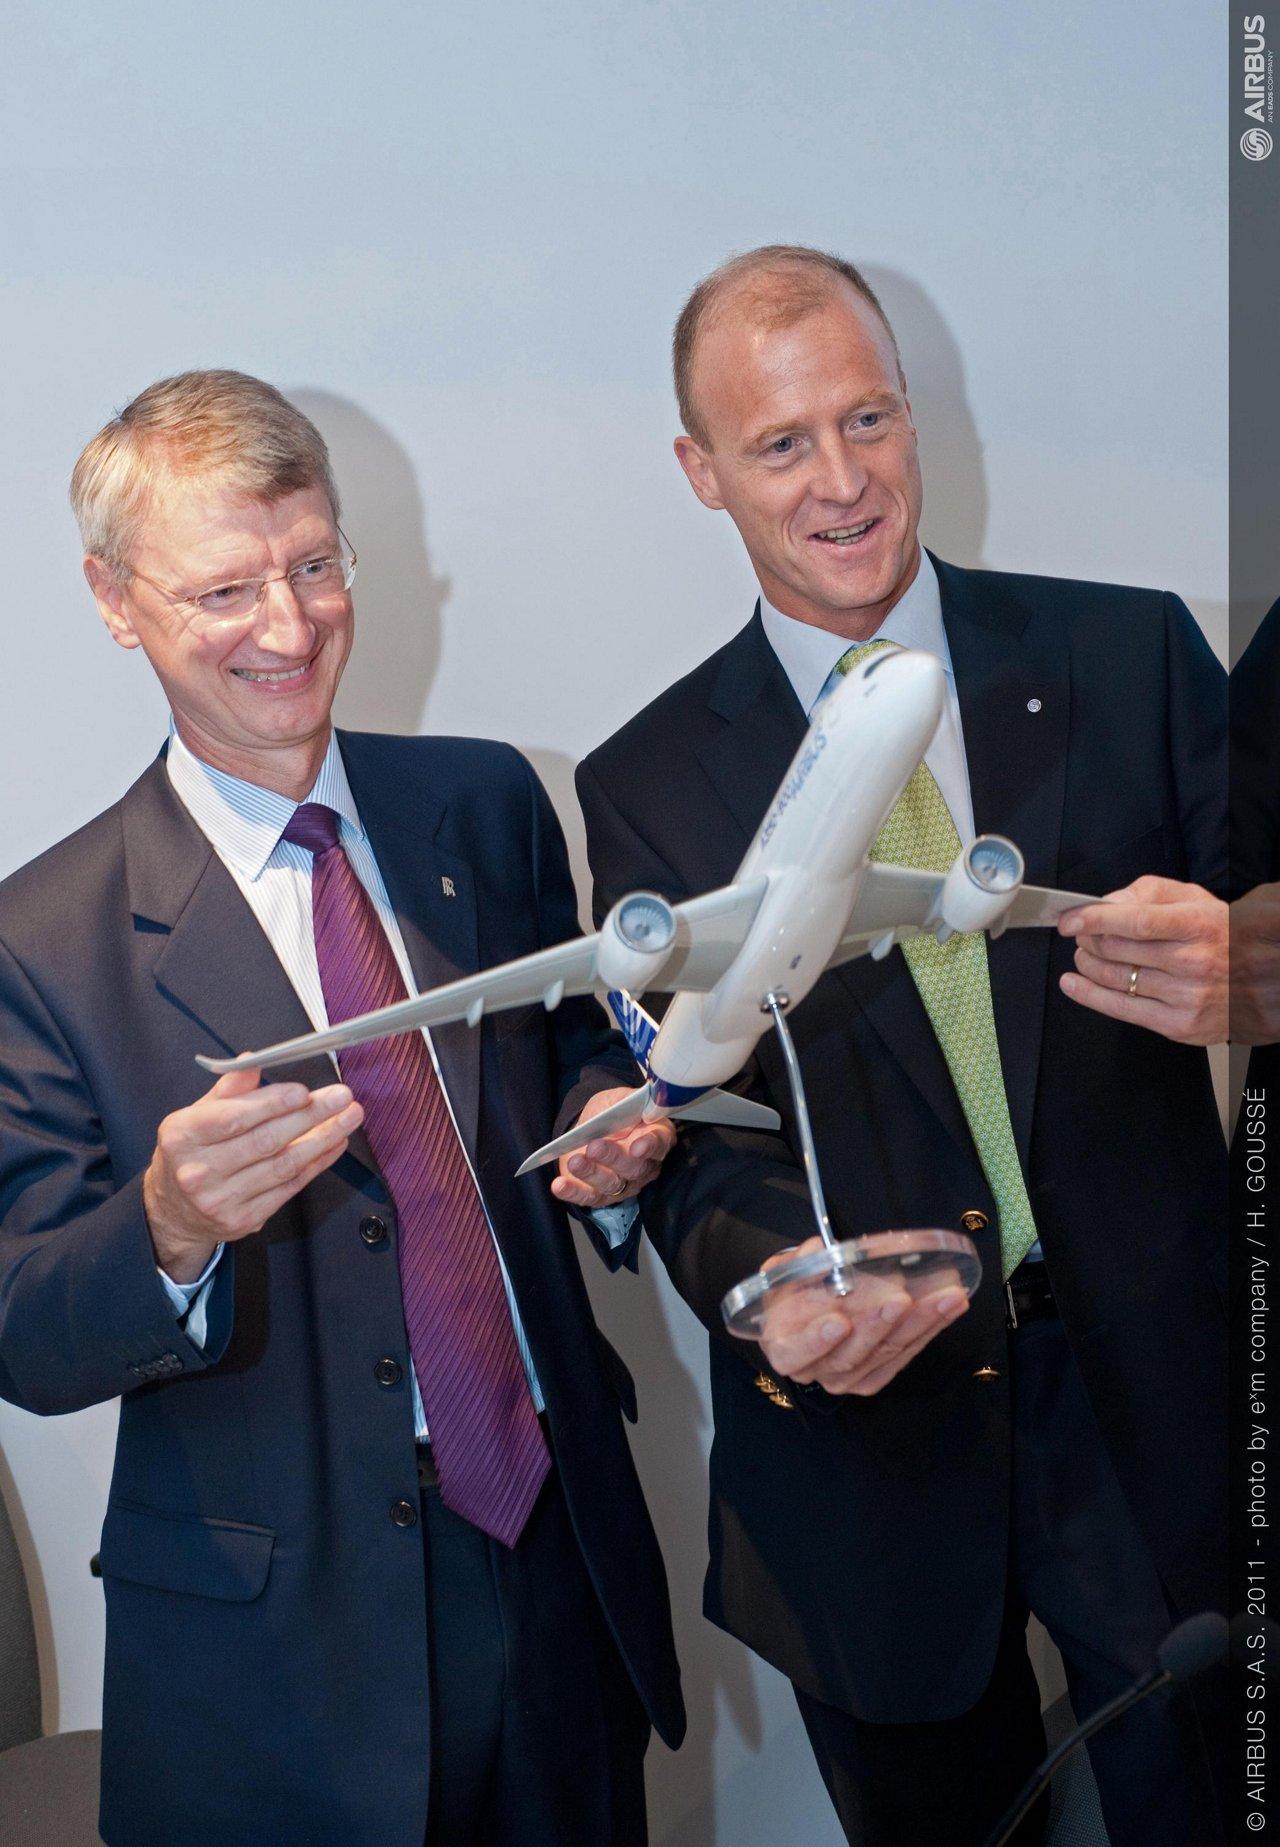 Rolls Royce agreement on enhanced A350-1000